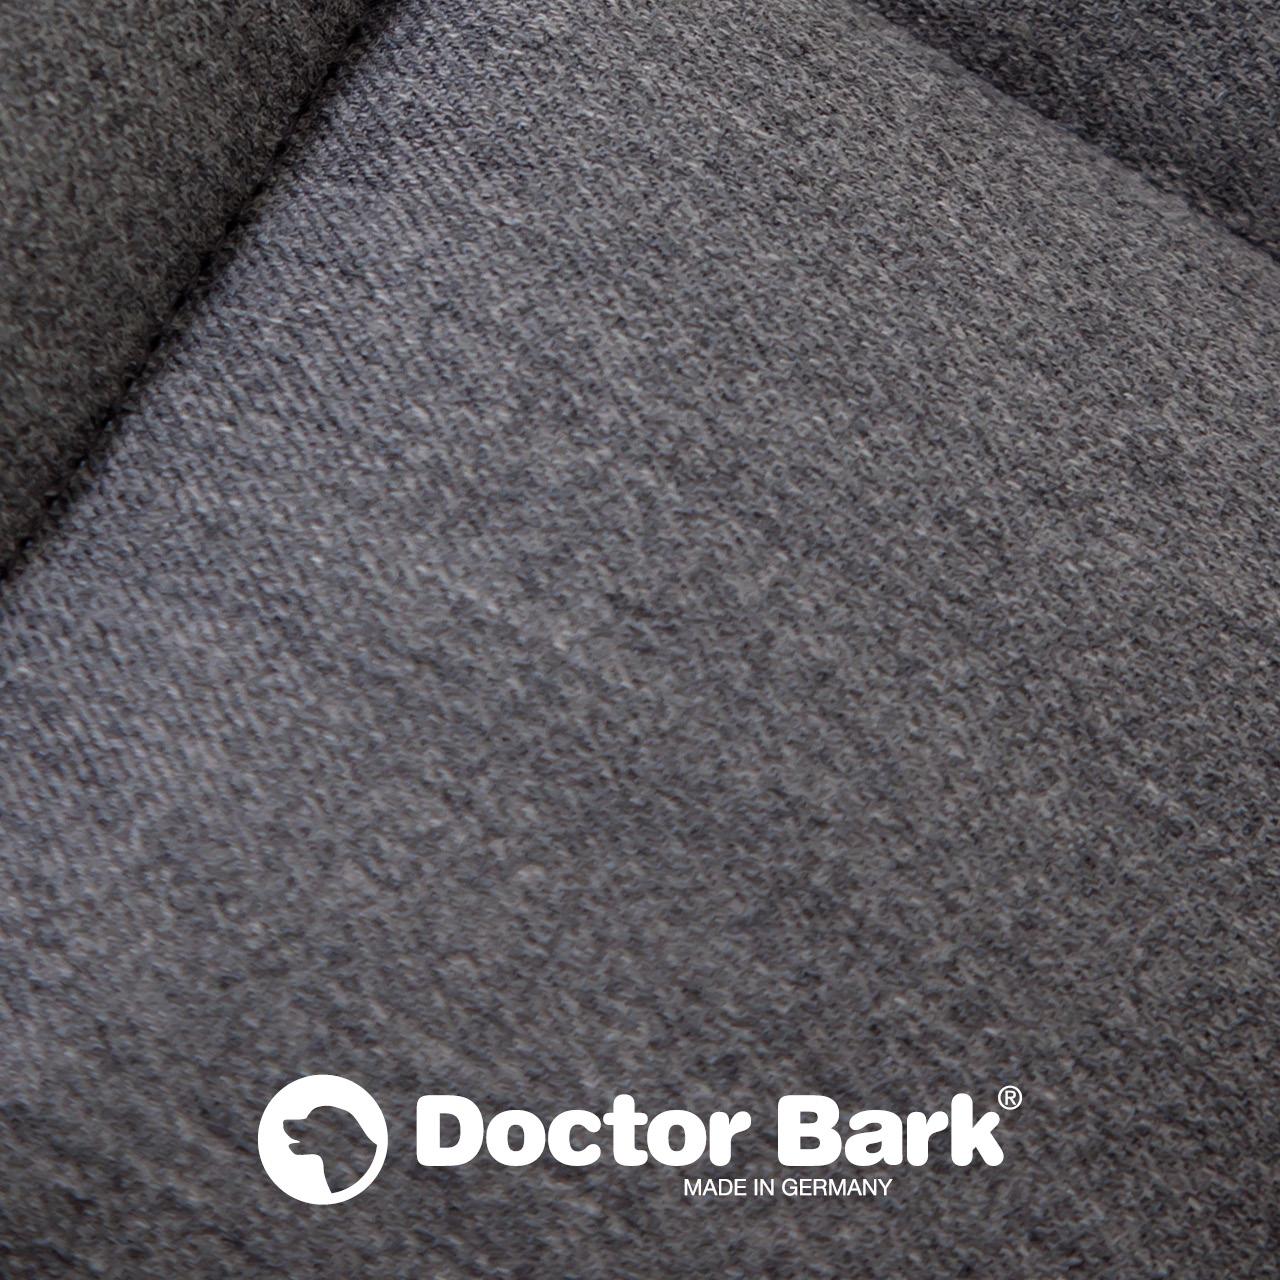 Doctor Bark - Hunde Autoschondecke - Beifahrersitz - grau